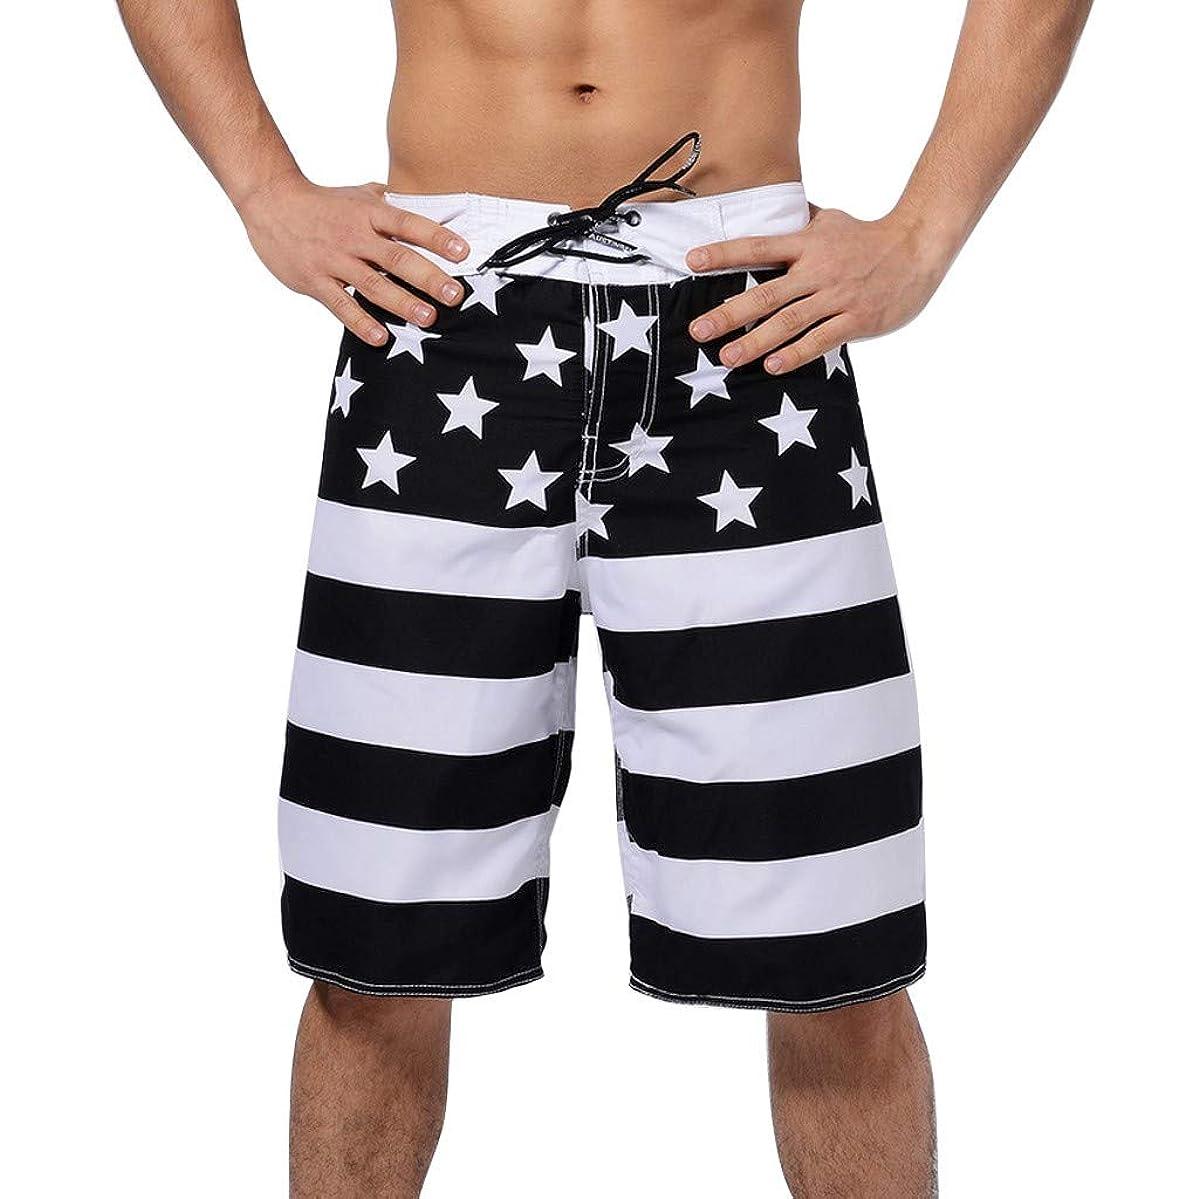 Men Swim Trunks Simayixx Men's Sportwear Quick Dry Board Shorts Teens America Flag Printed Short Pants Bathing Suit Line